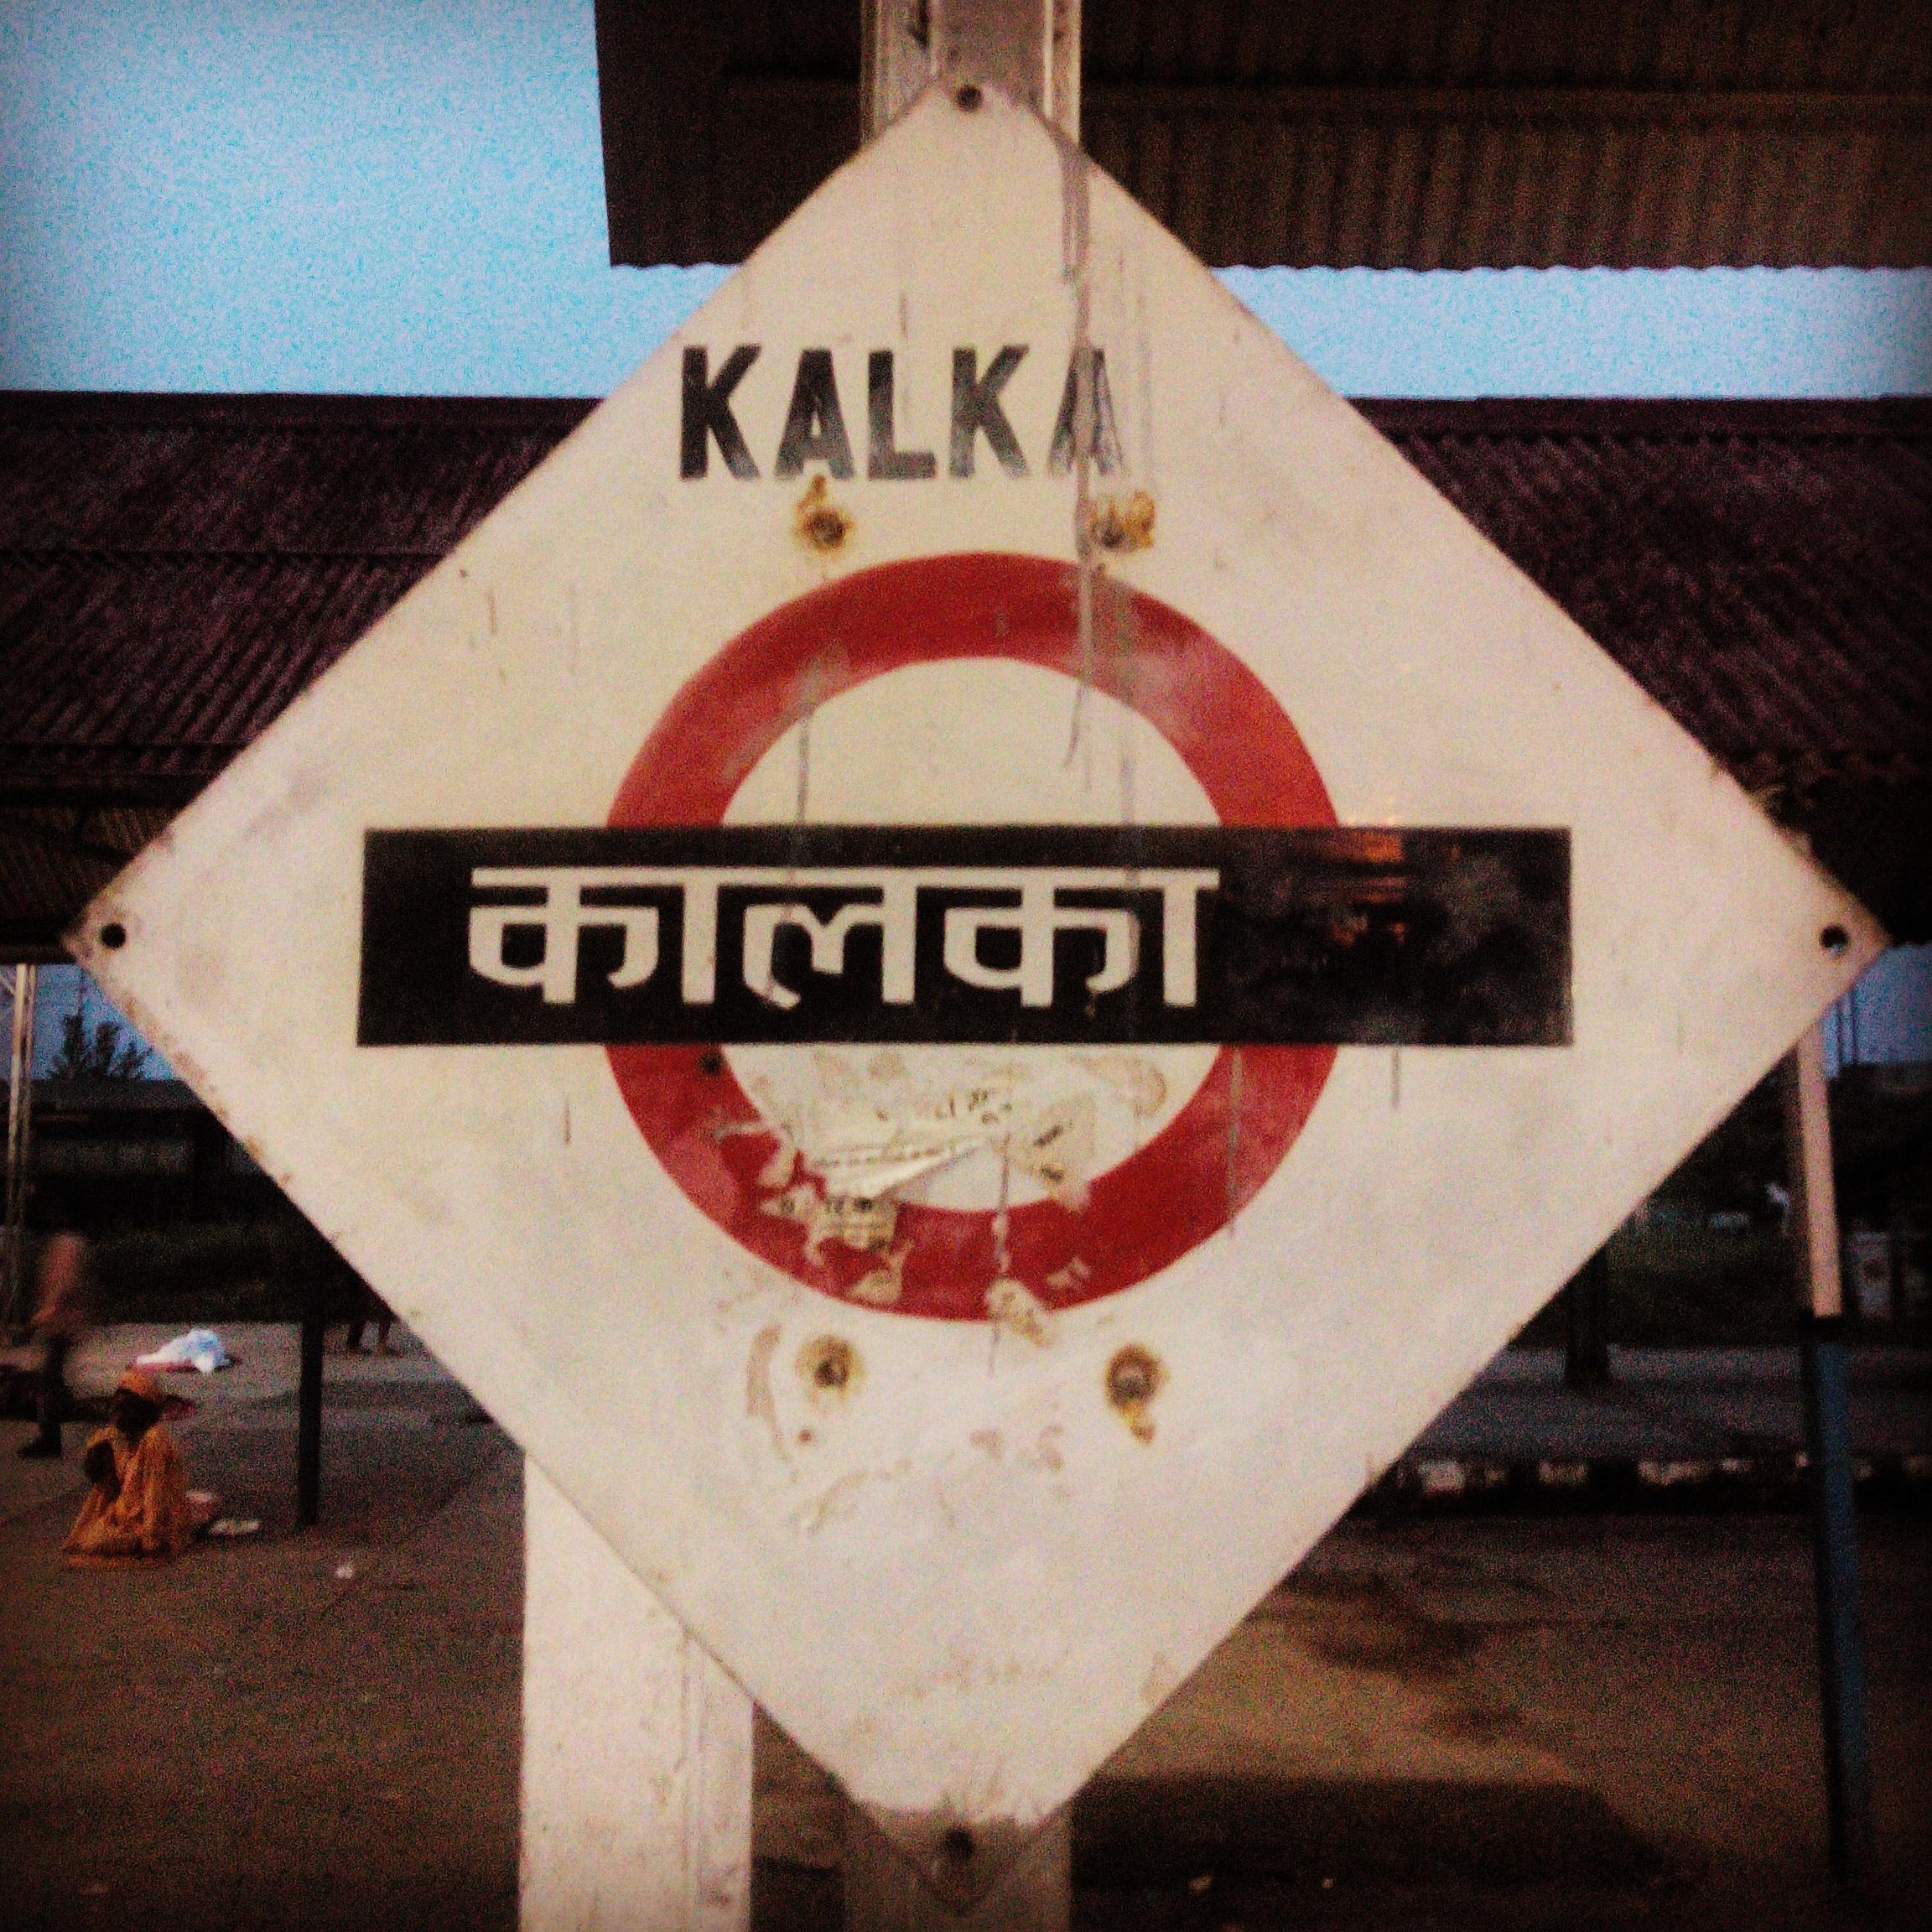 Kalka-sign.jpg